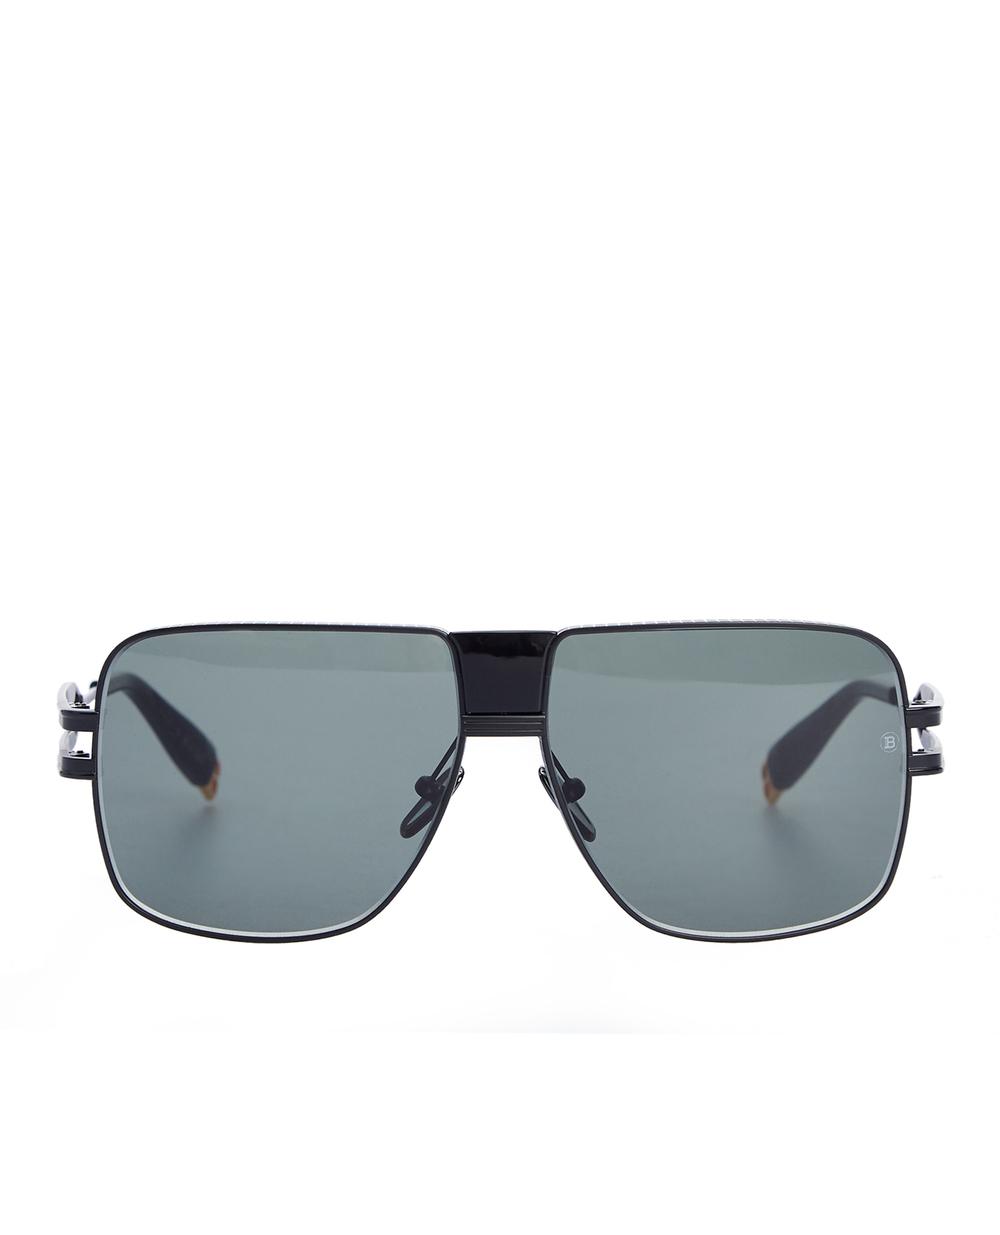 Солнцезащитные очки Balmain BPS-103C-60 — Kameron